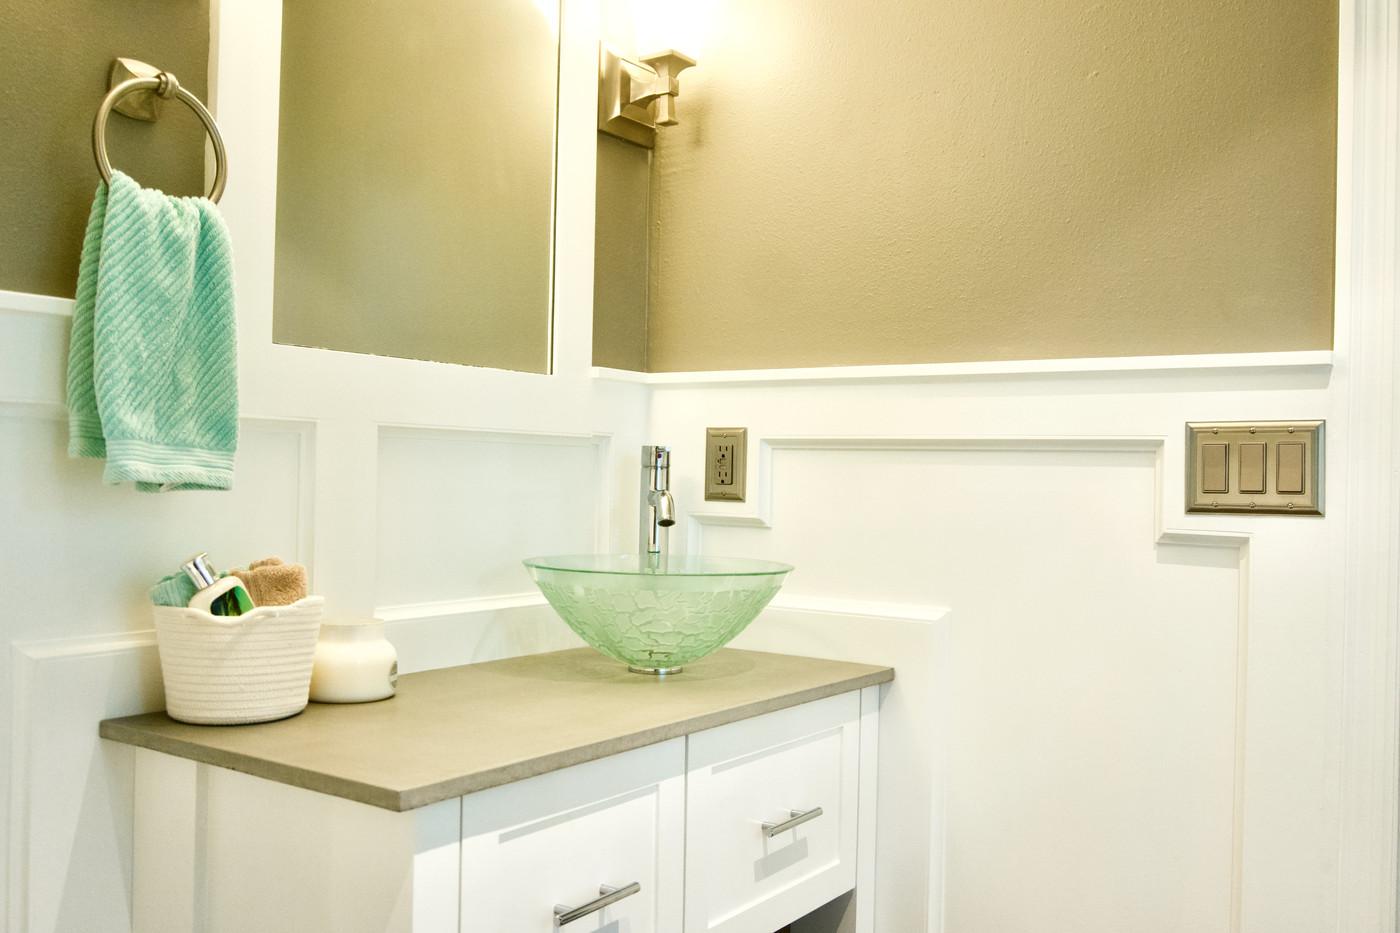 Beach Themed Bathroom With Concrete Vanity Top